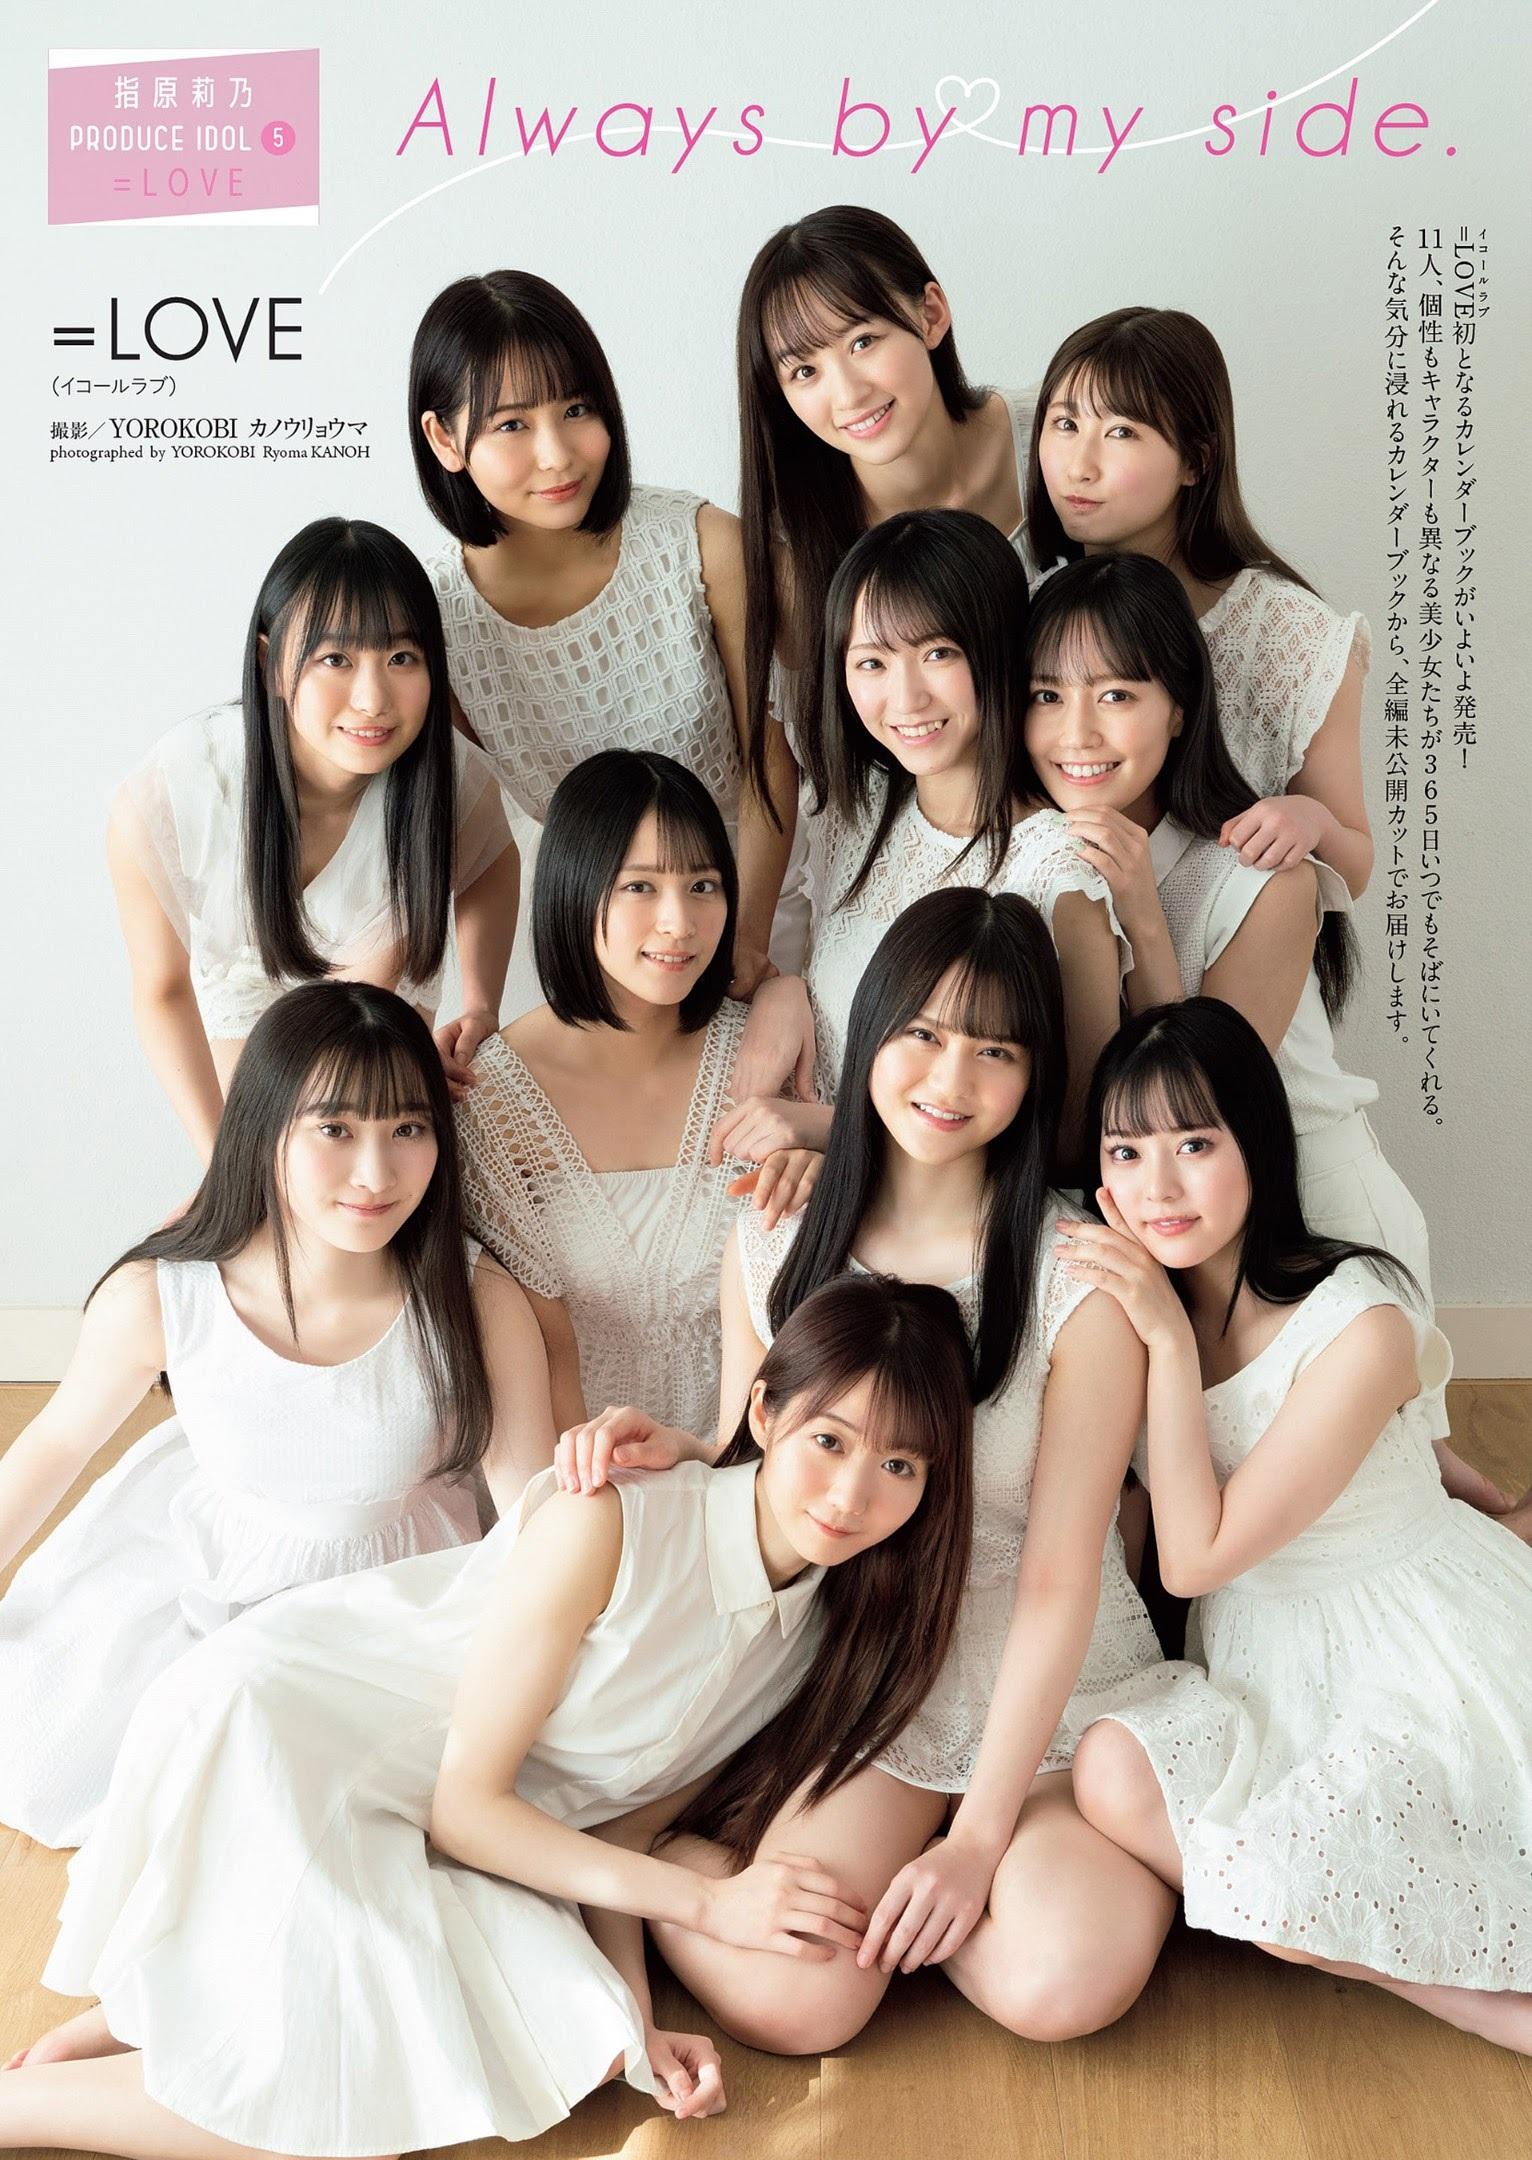 =LOVE1